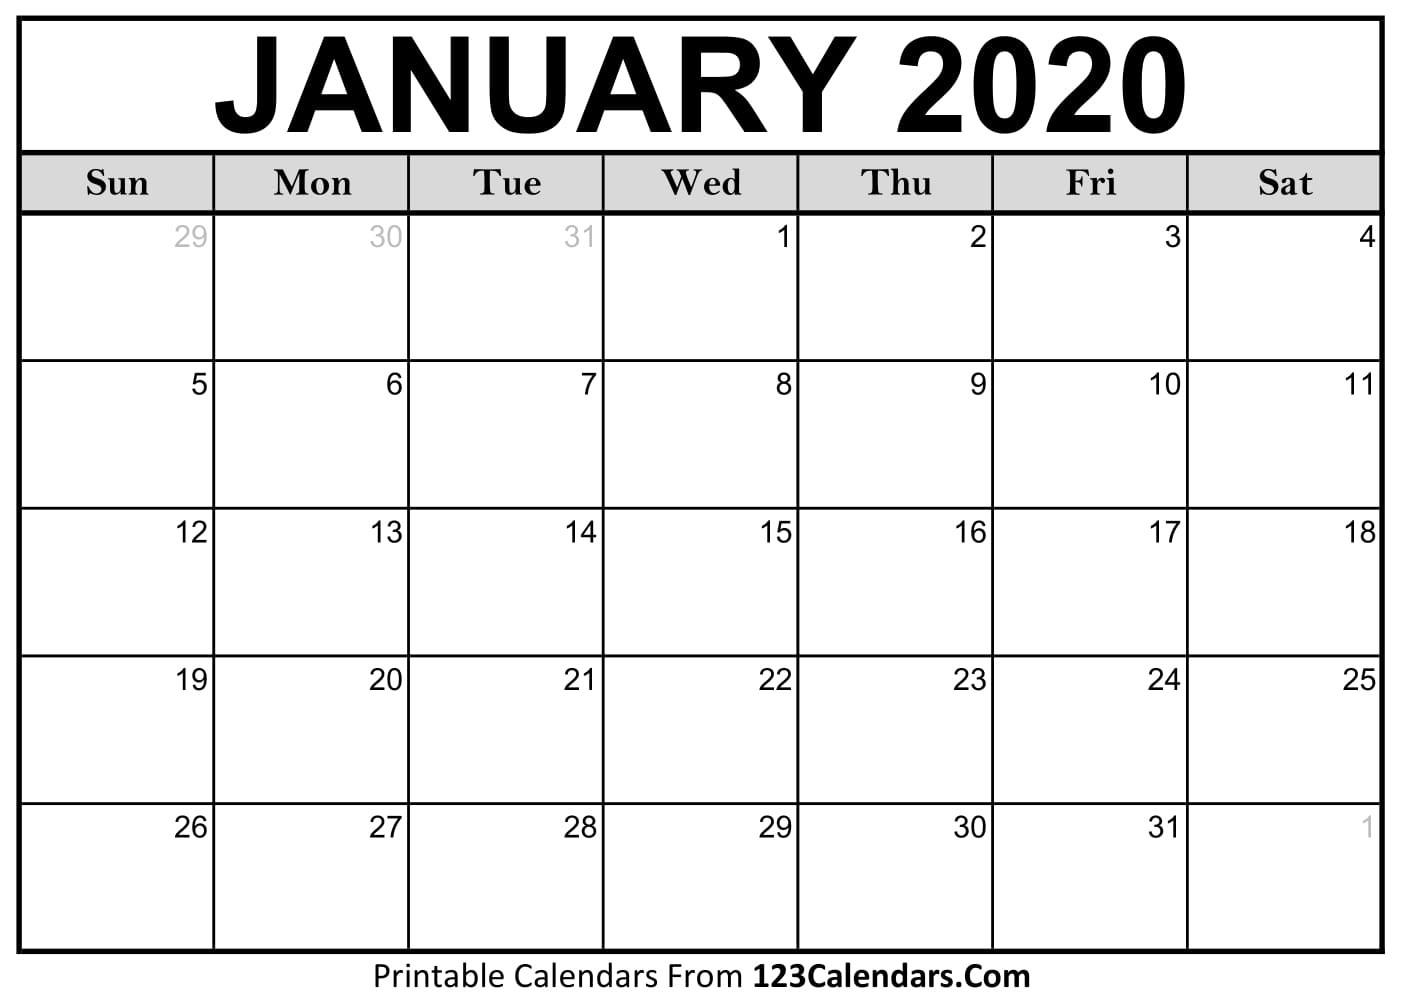 Printable Fill In Calendar For 2020 - Calendar Inspiration Design-Free Fill In Calendar